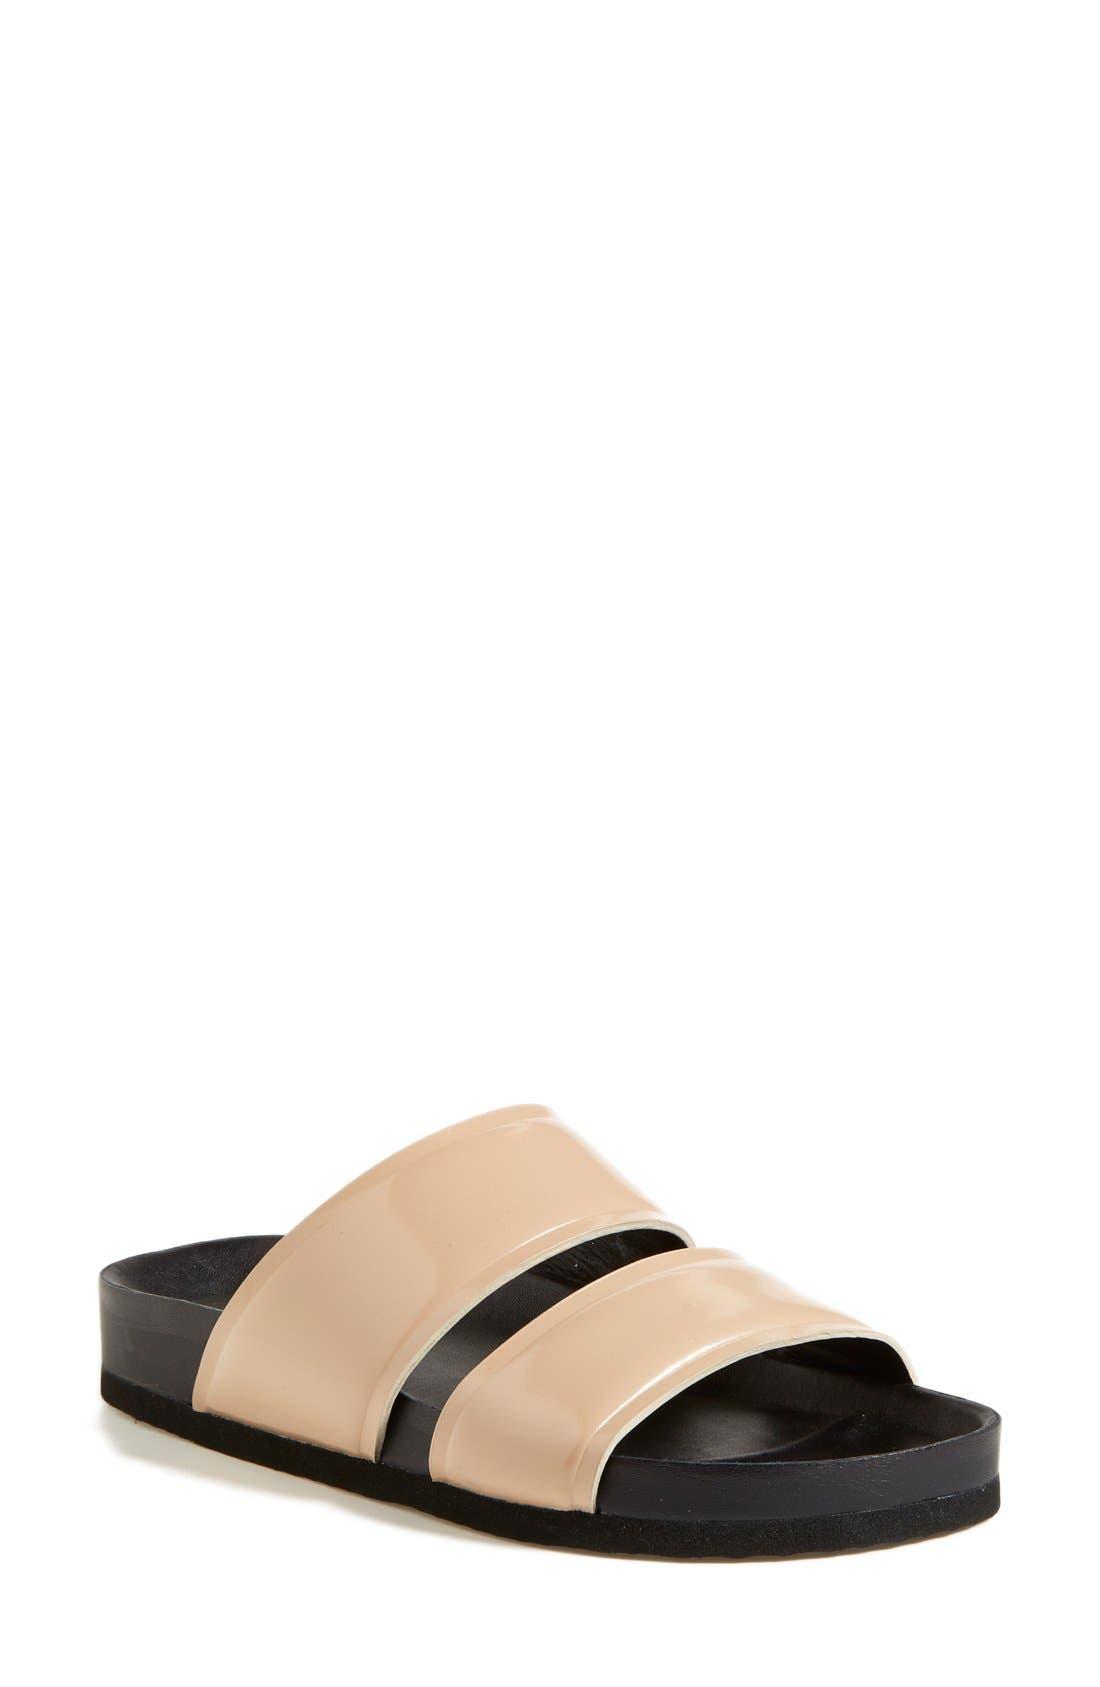 Alternate Image 1 Selected - Vince 'Orion' Slide Sandal (Women)